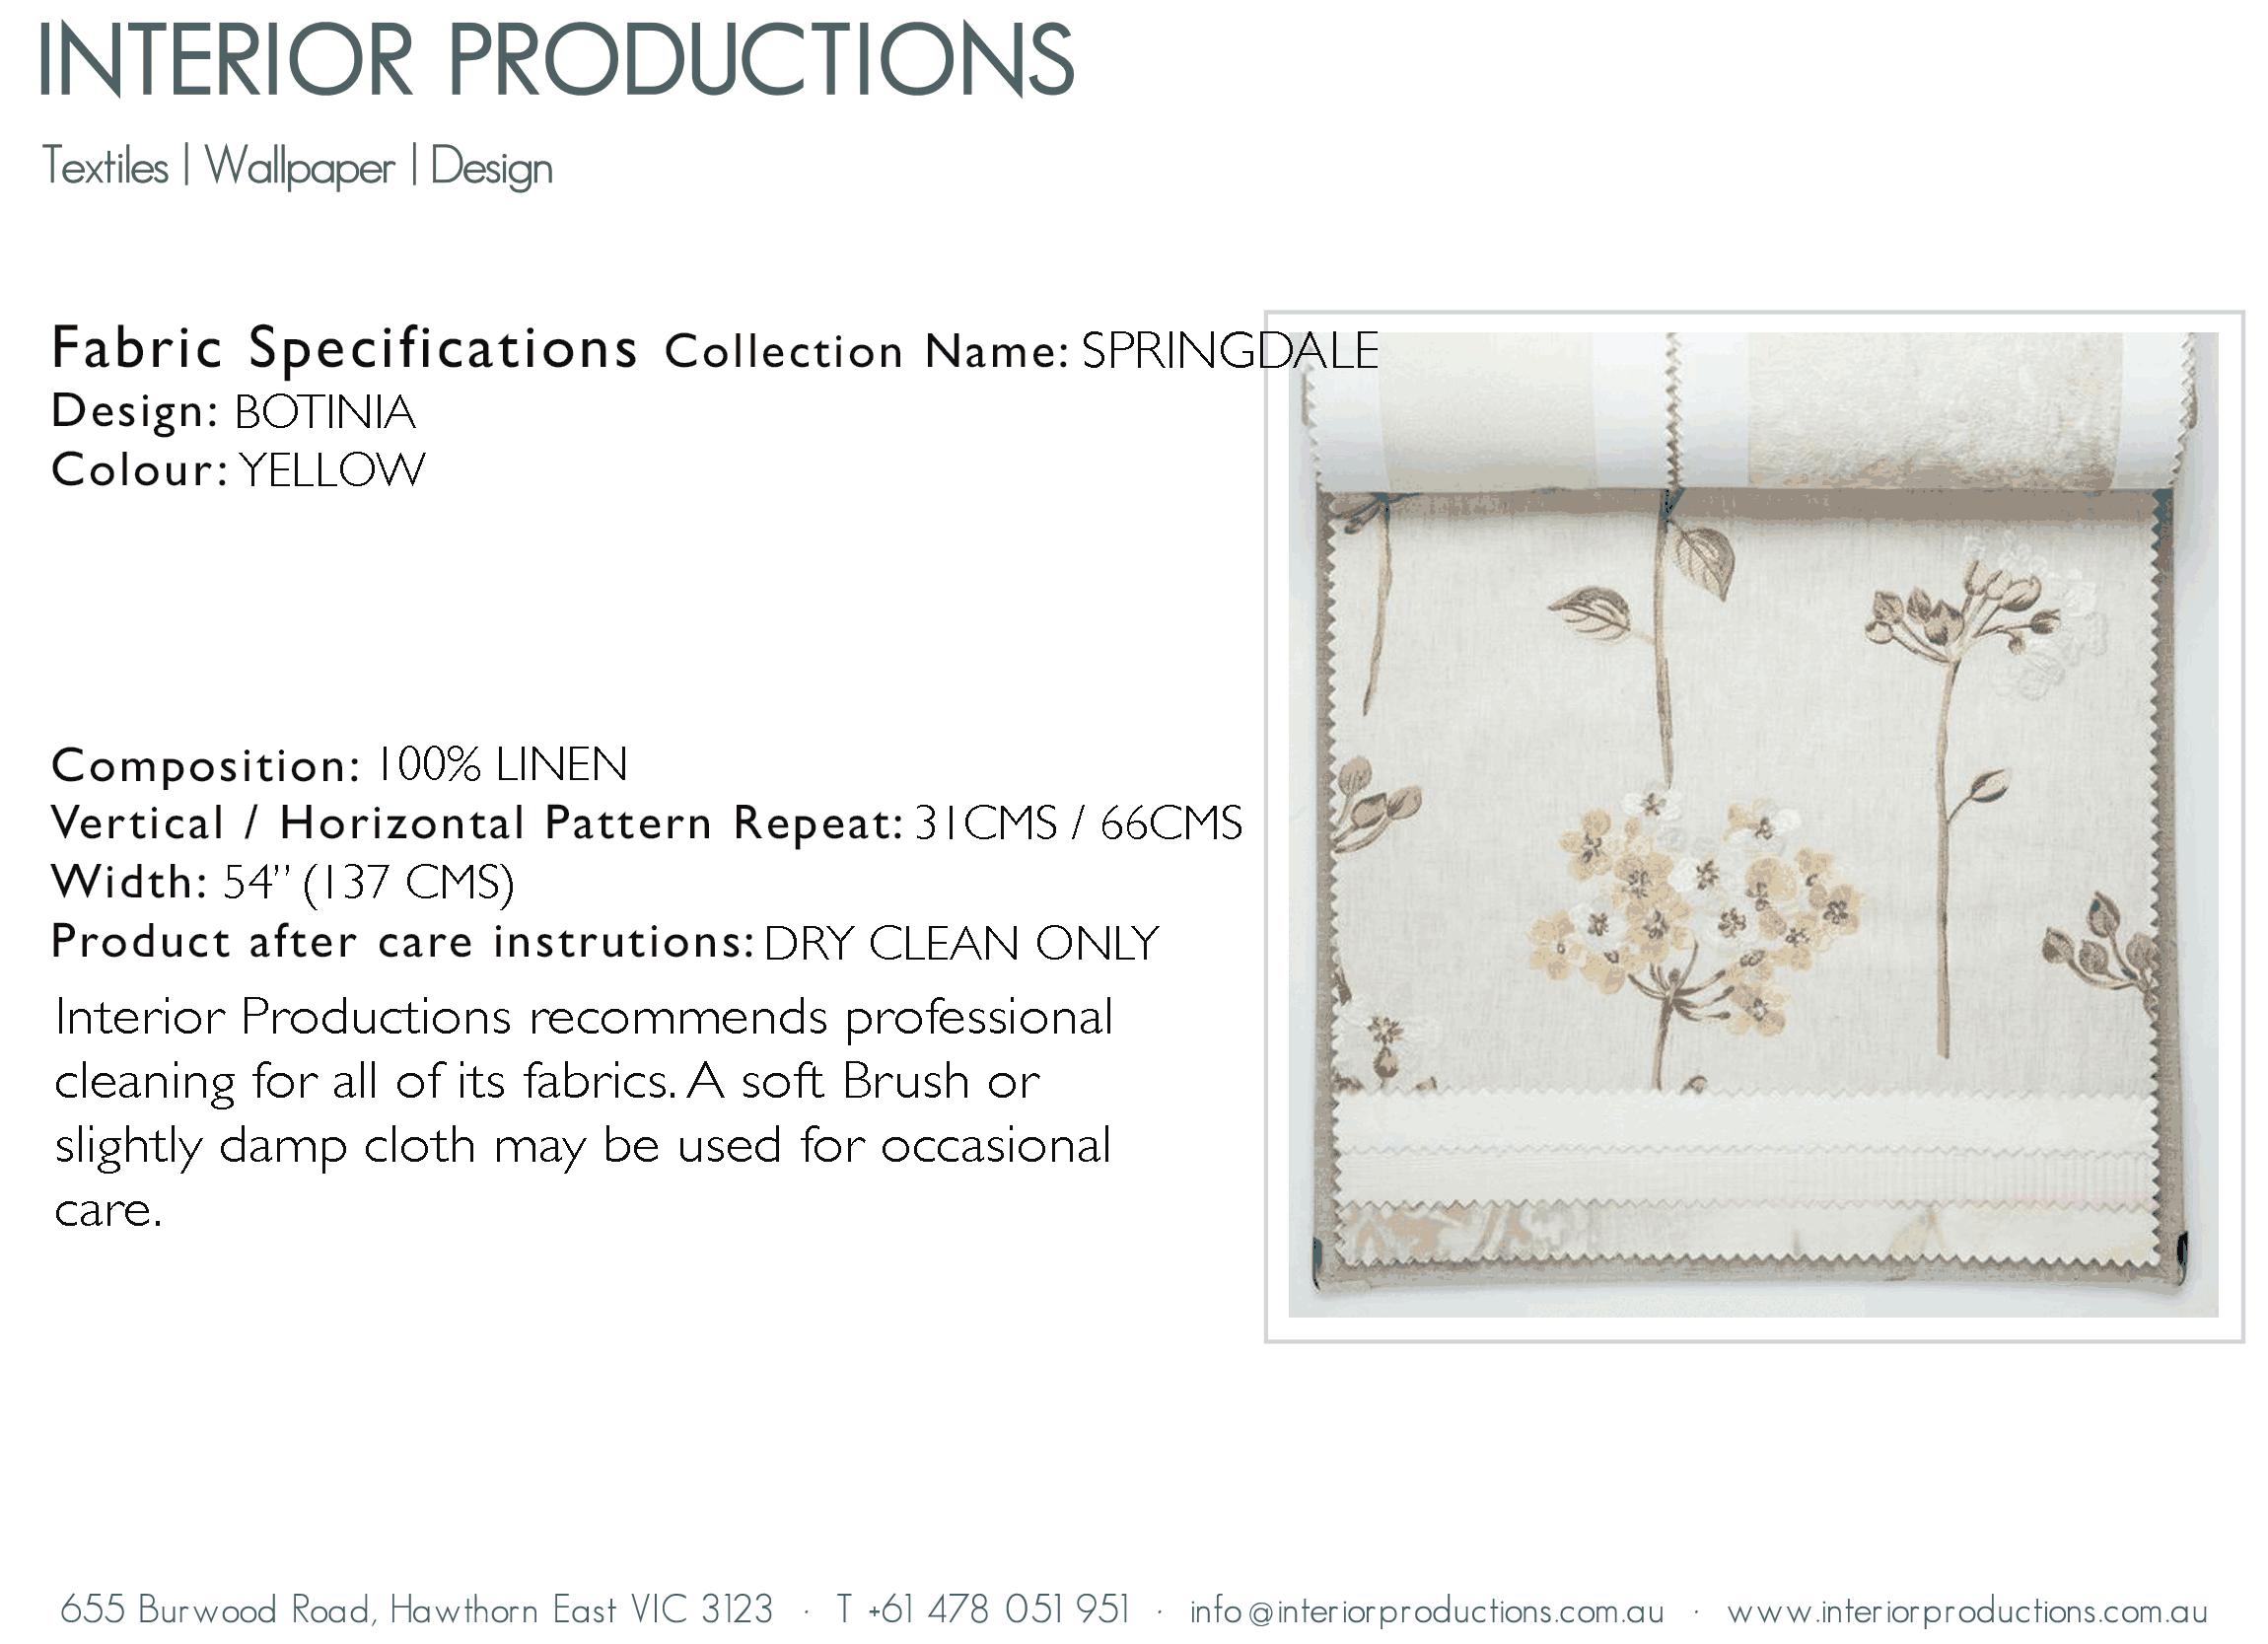 interior_productions_BOTINIA---YELLOW